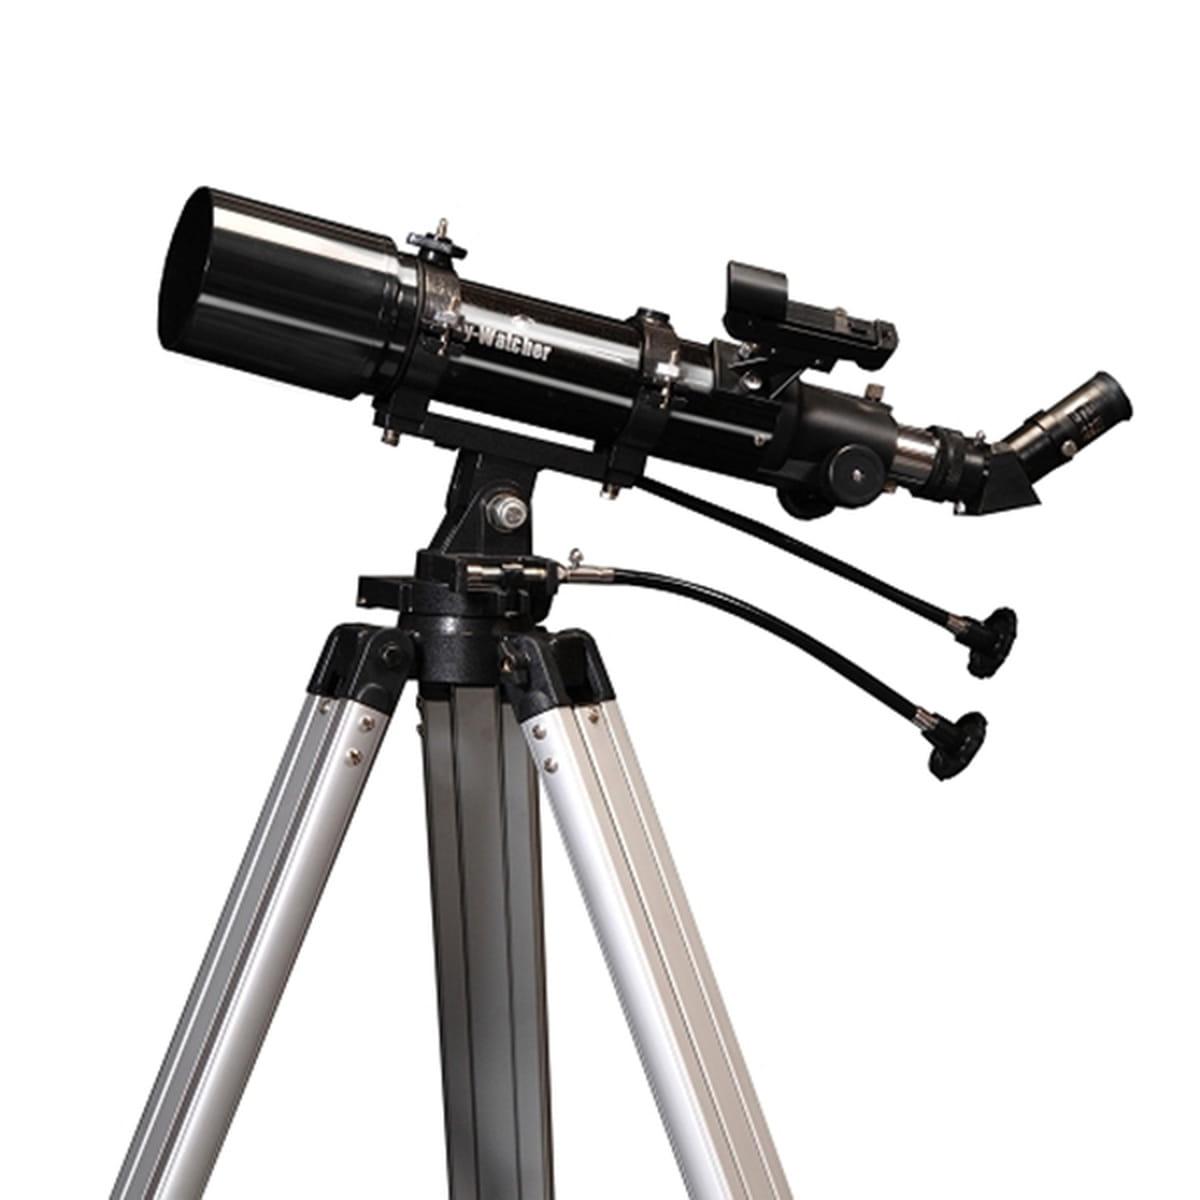 SKY-WATCHER MERCURY 705 70 mm f/7.1 AZ3 Achromatic Refractor